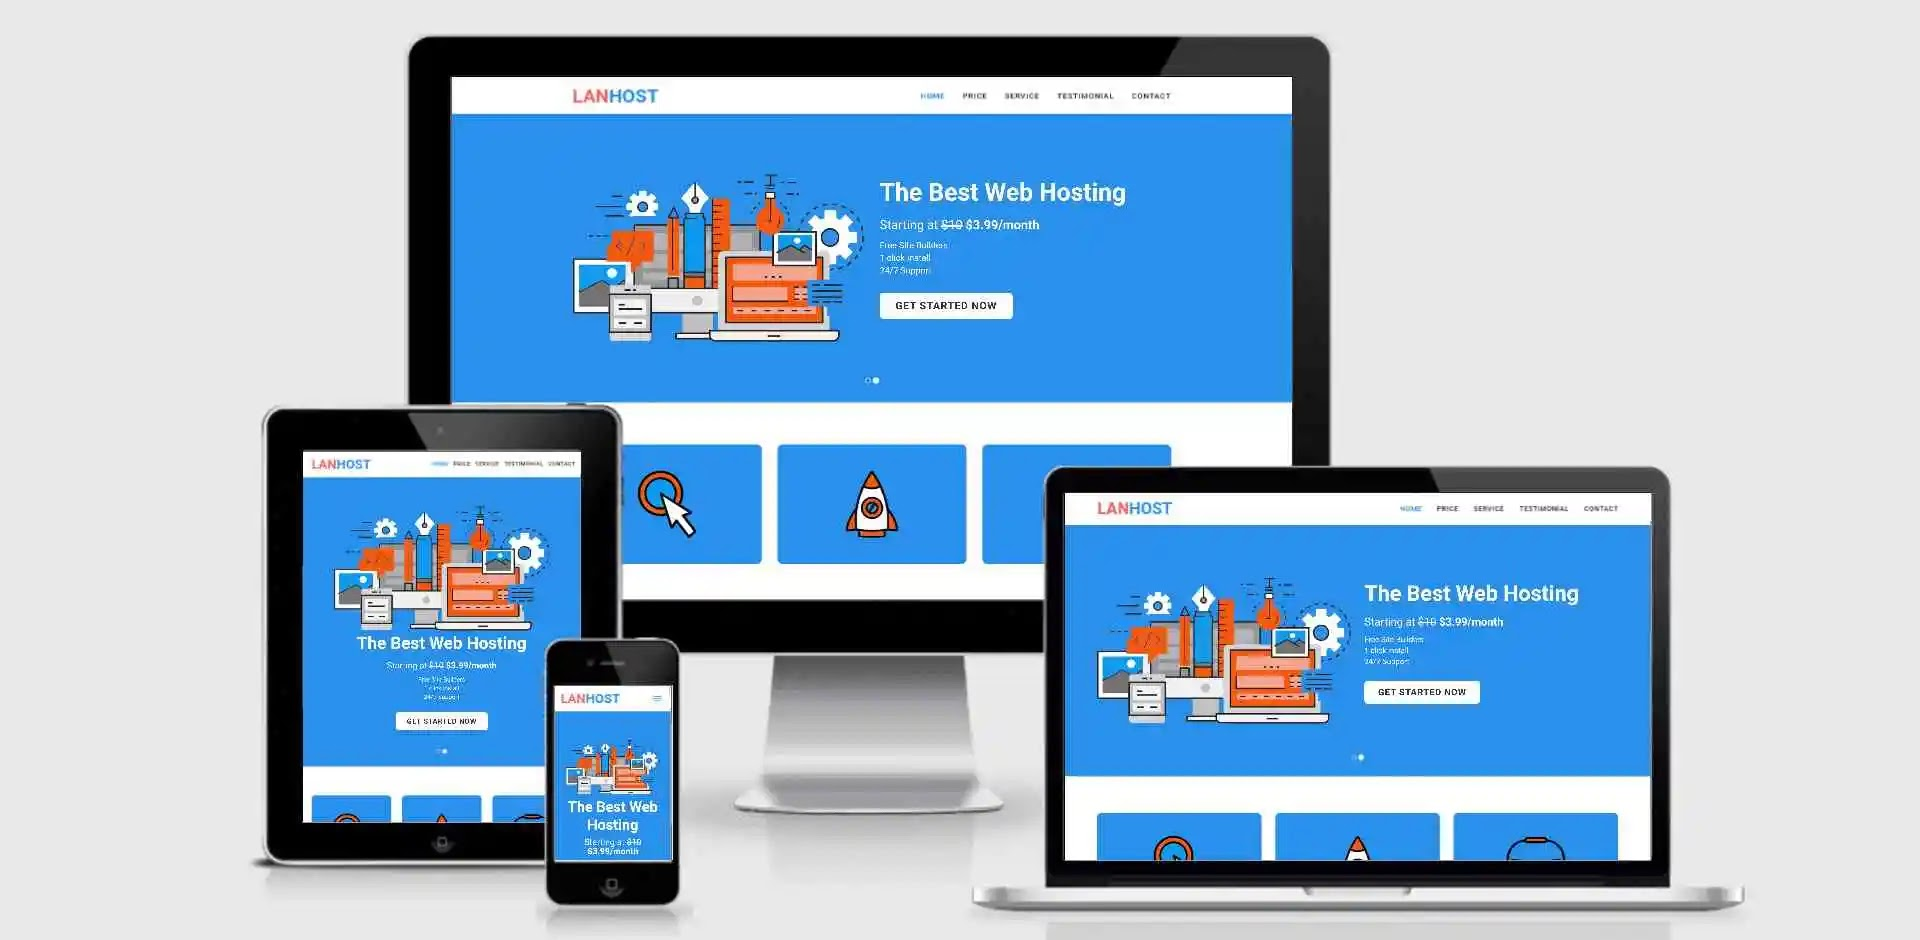 Giao Diện Website Blogspot LanHost Landing Page